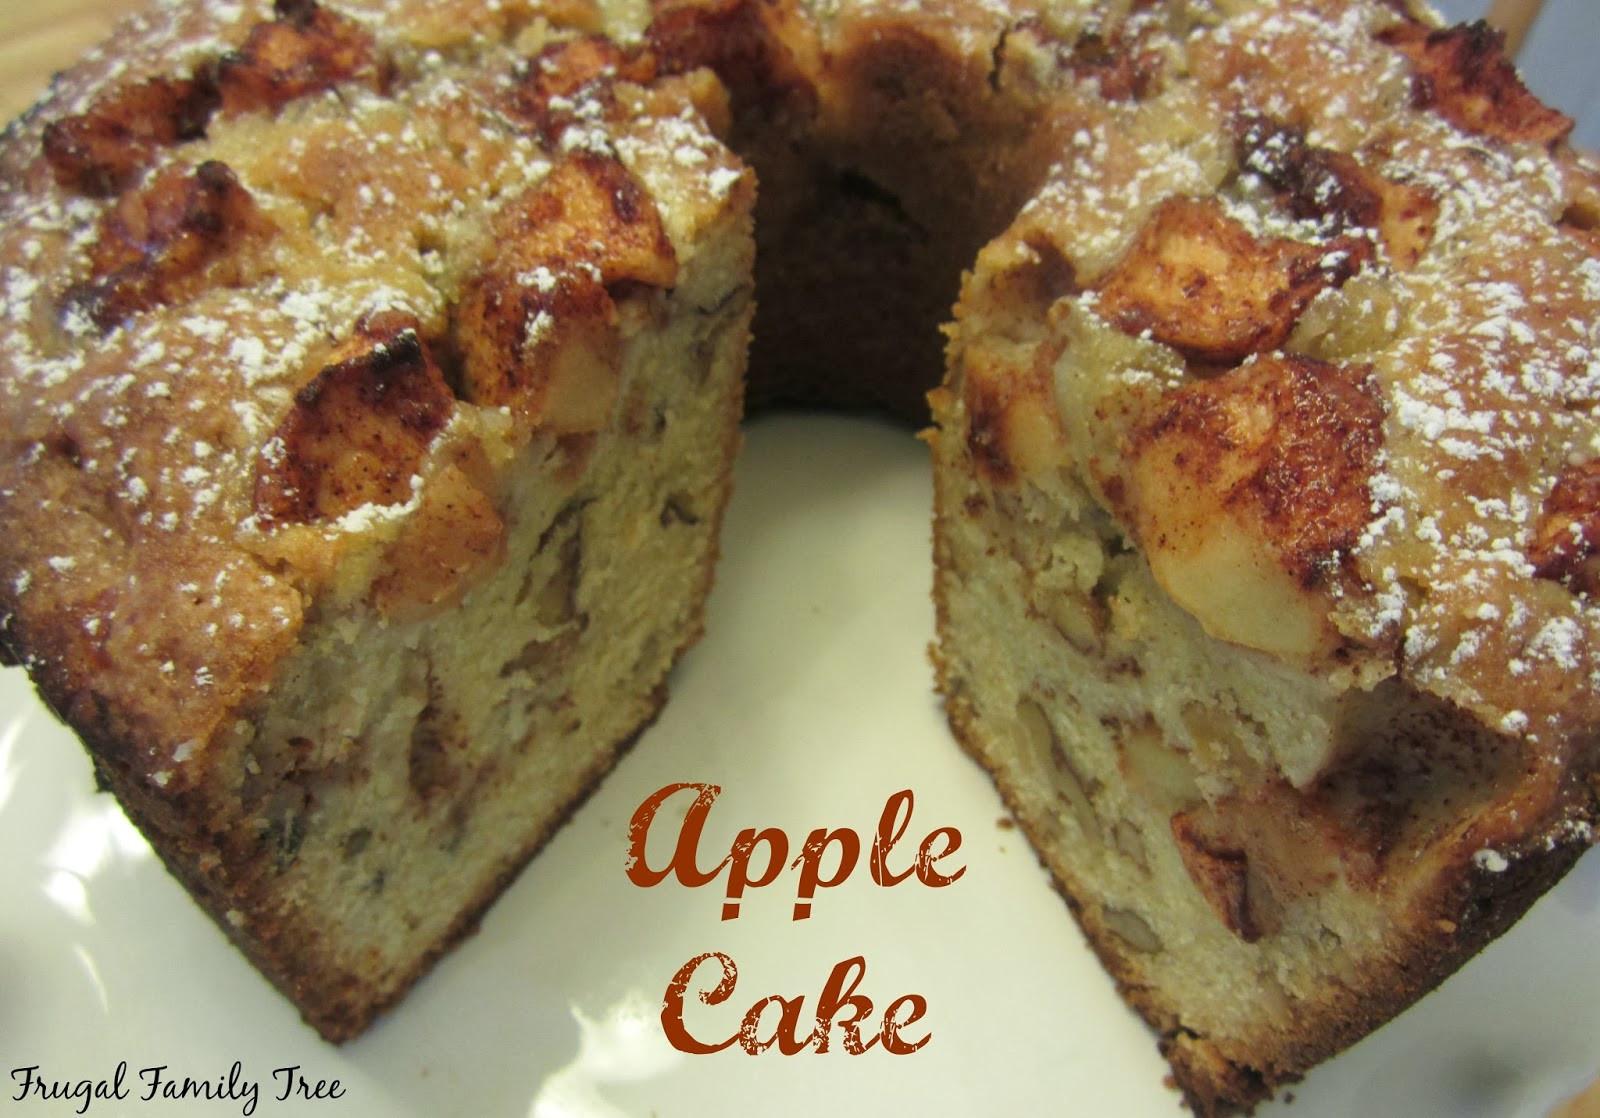 Smitten Kitchen Apple Cake  Apple Cake Recipe From Smitten Kitchen